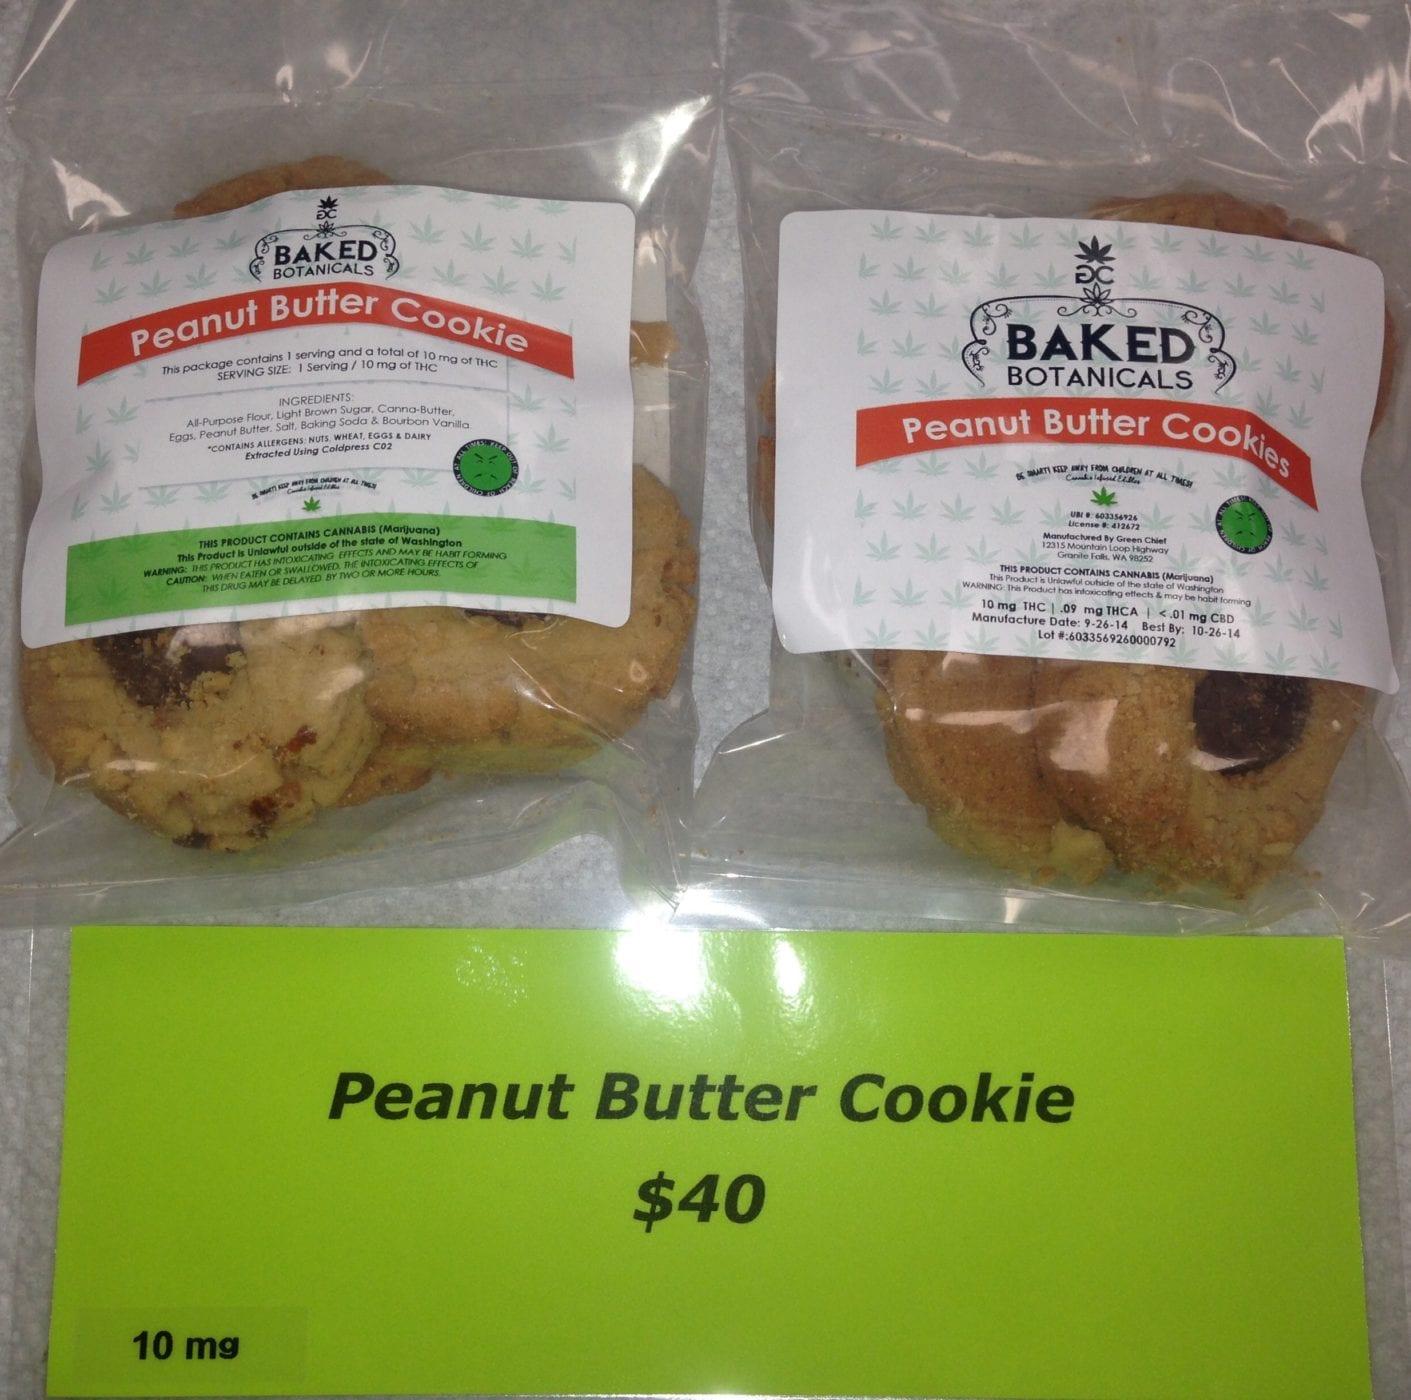 Edible Cookie photo